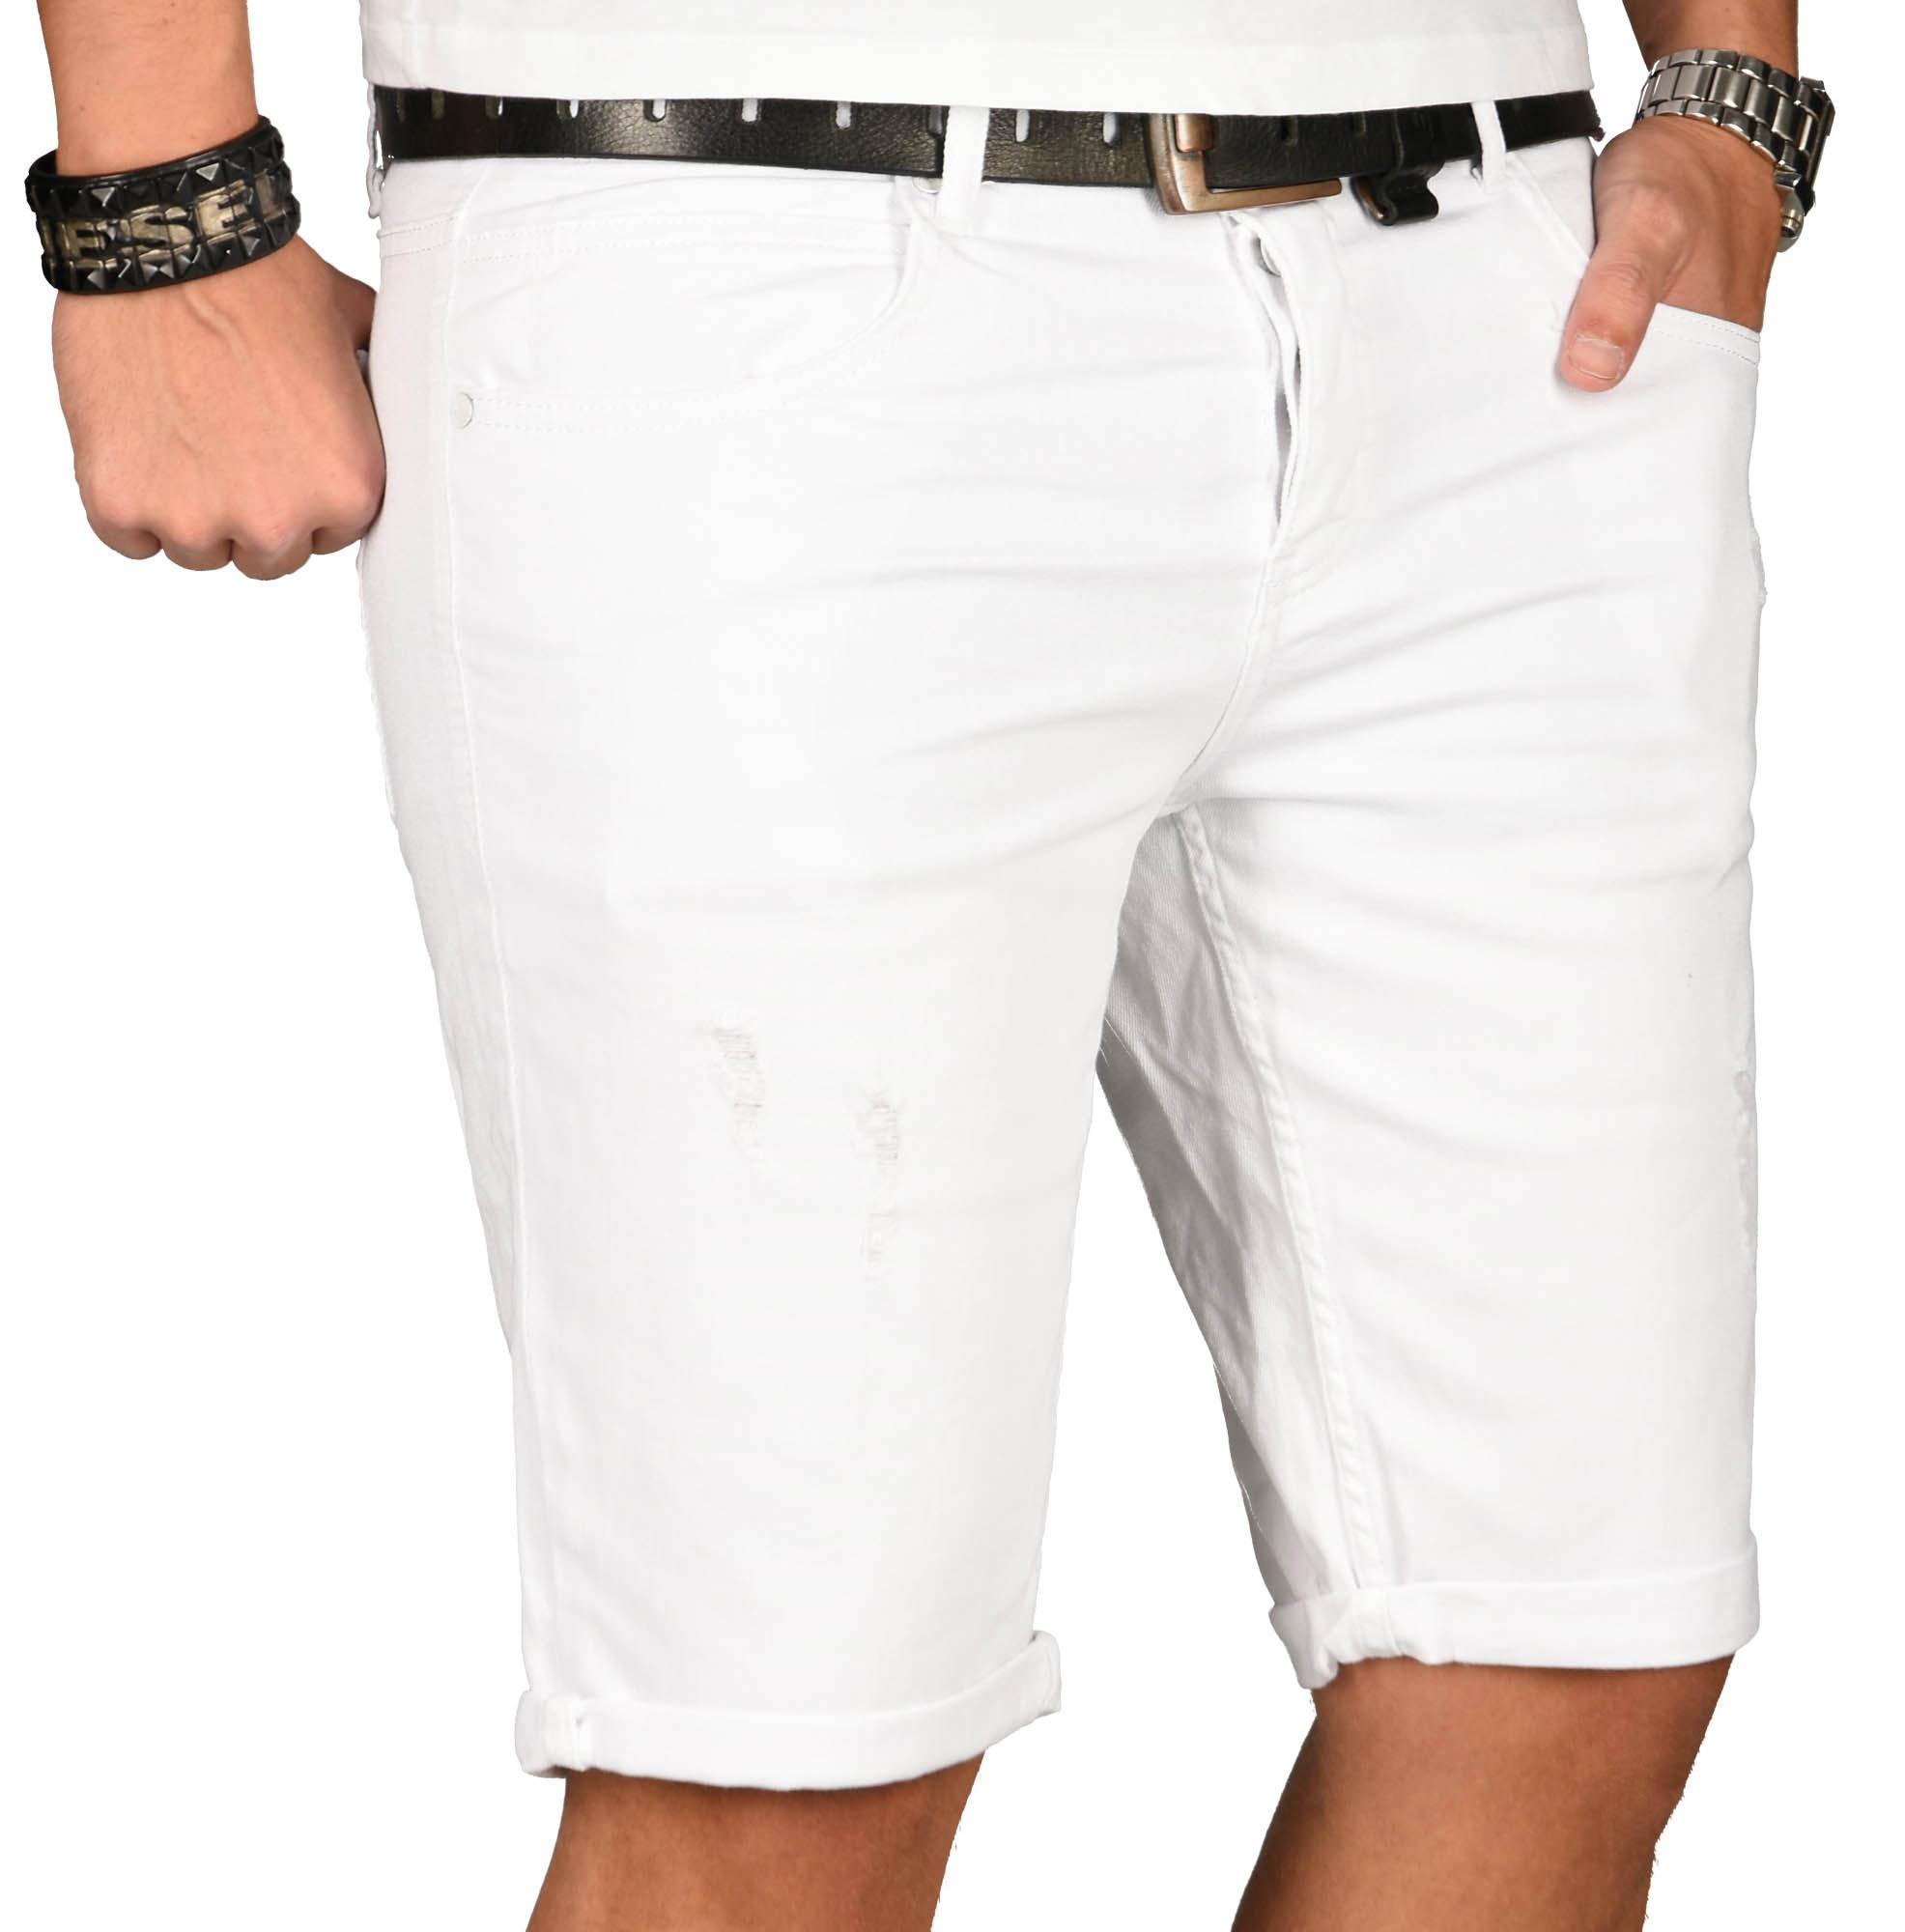 A-Salvarini-Herren-Designer-Jeans-Short-kurze-Hose-Slim-Sommer-Shorts-Washed Indexbild 3